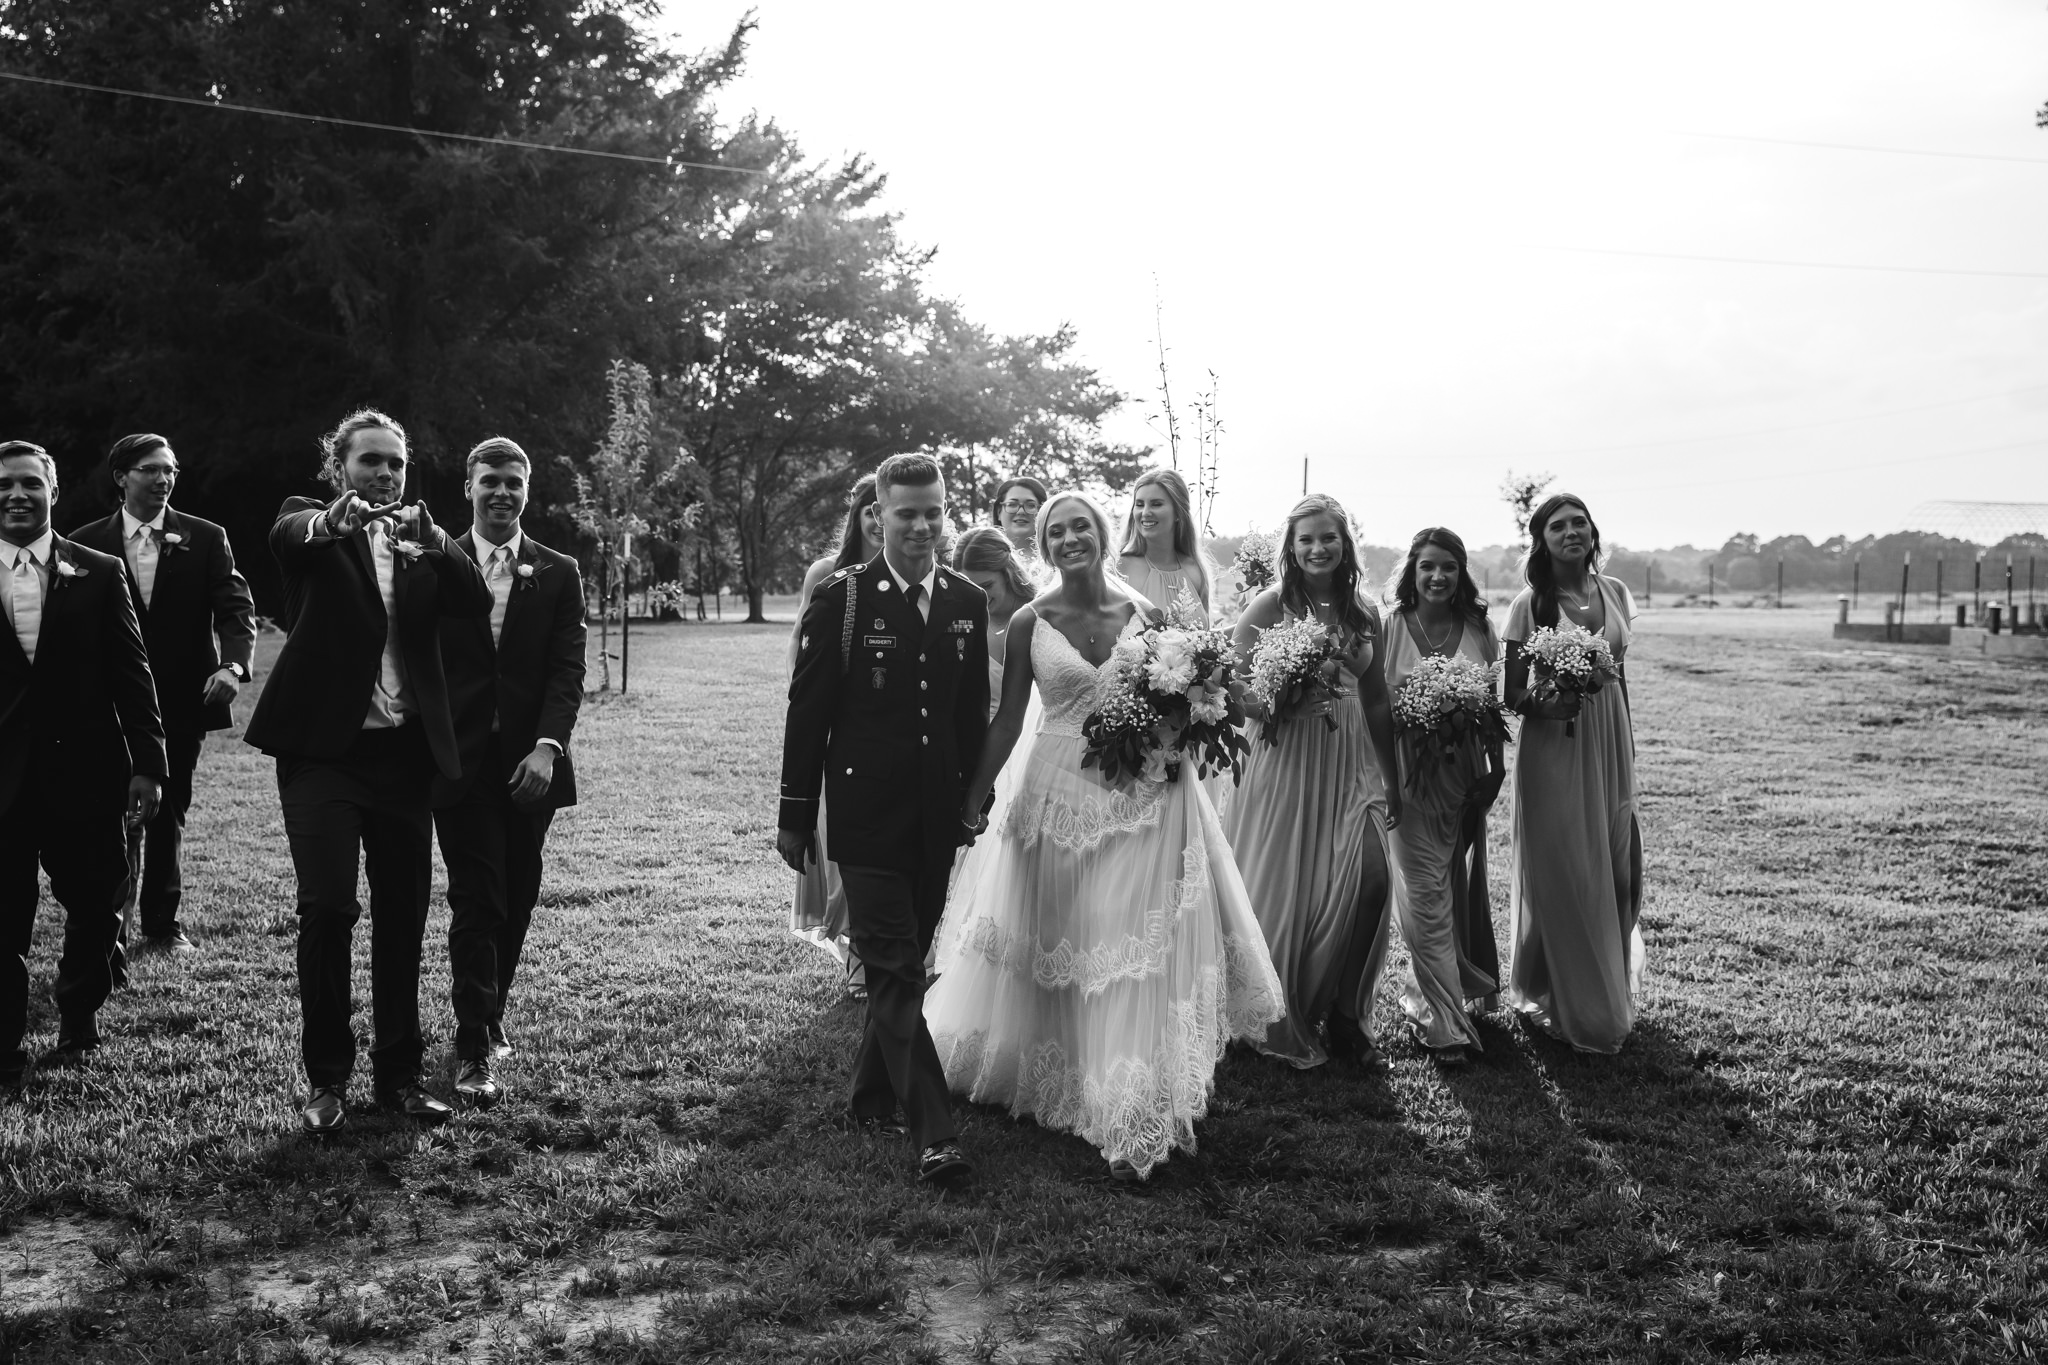 backyard-wedding-thewarmtharoundyou-lexy-branson-4-2.jpg